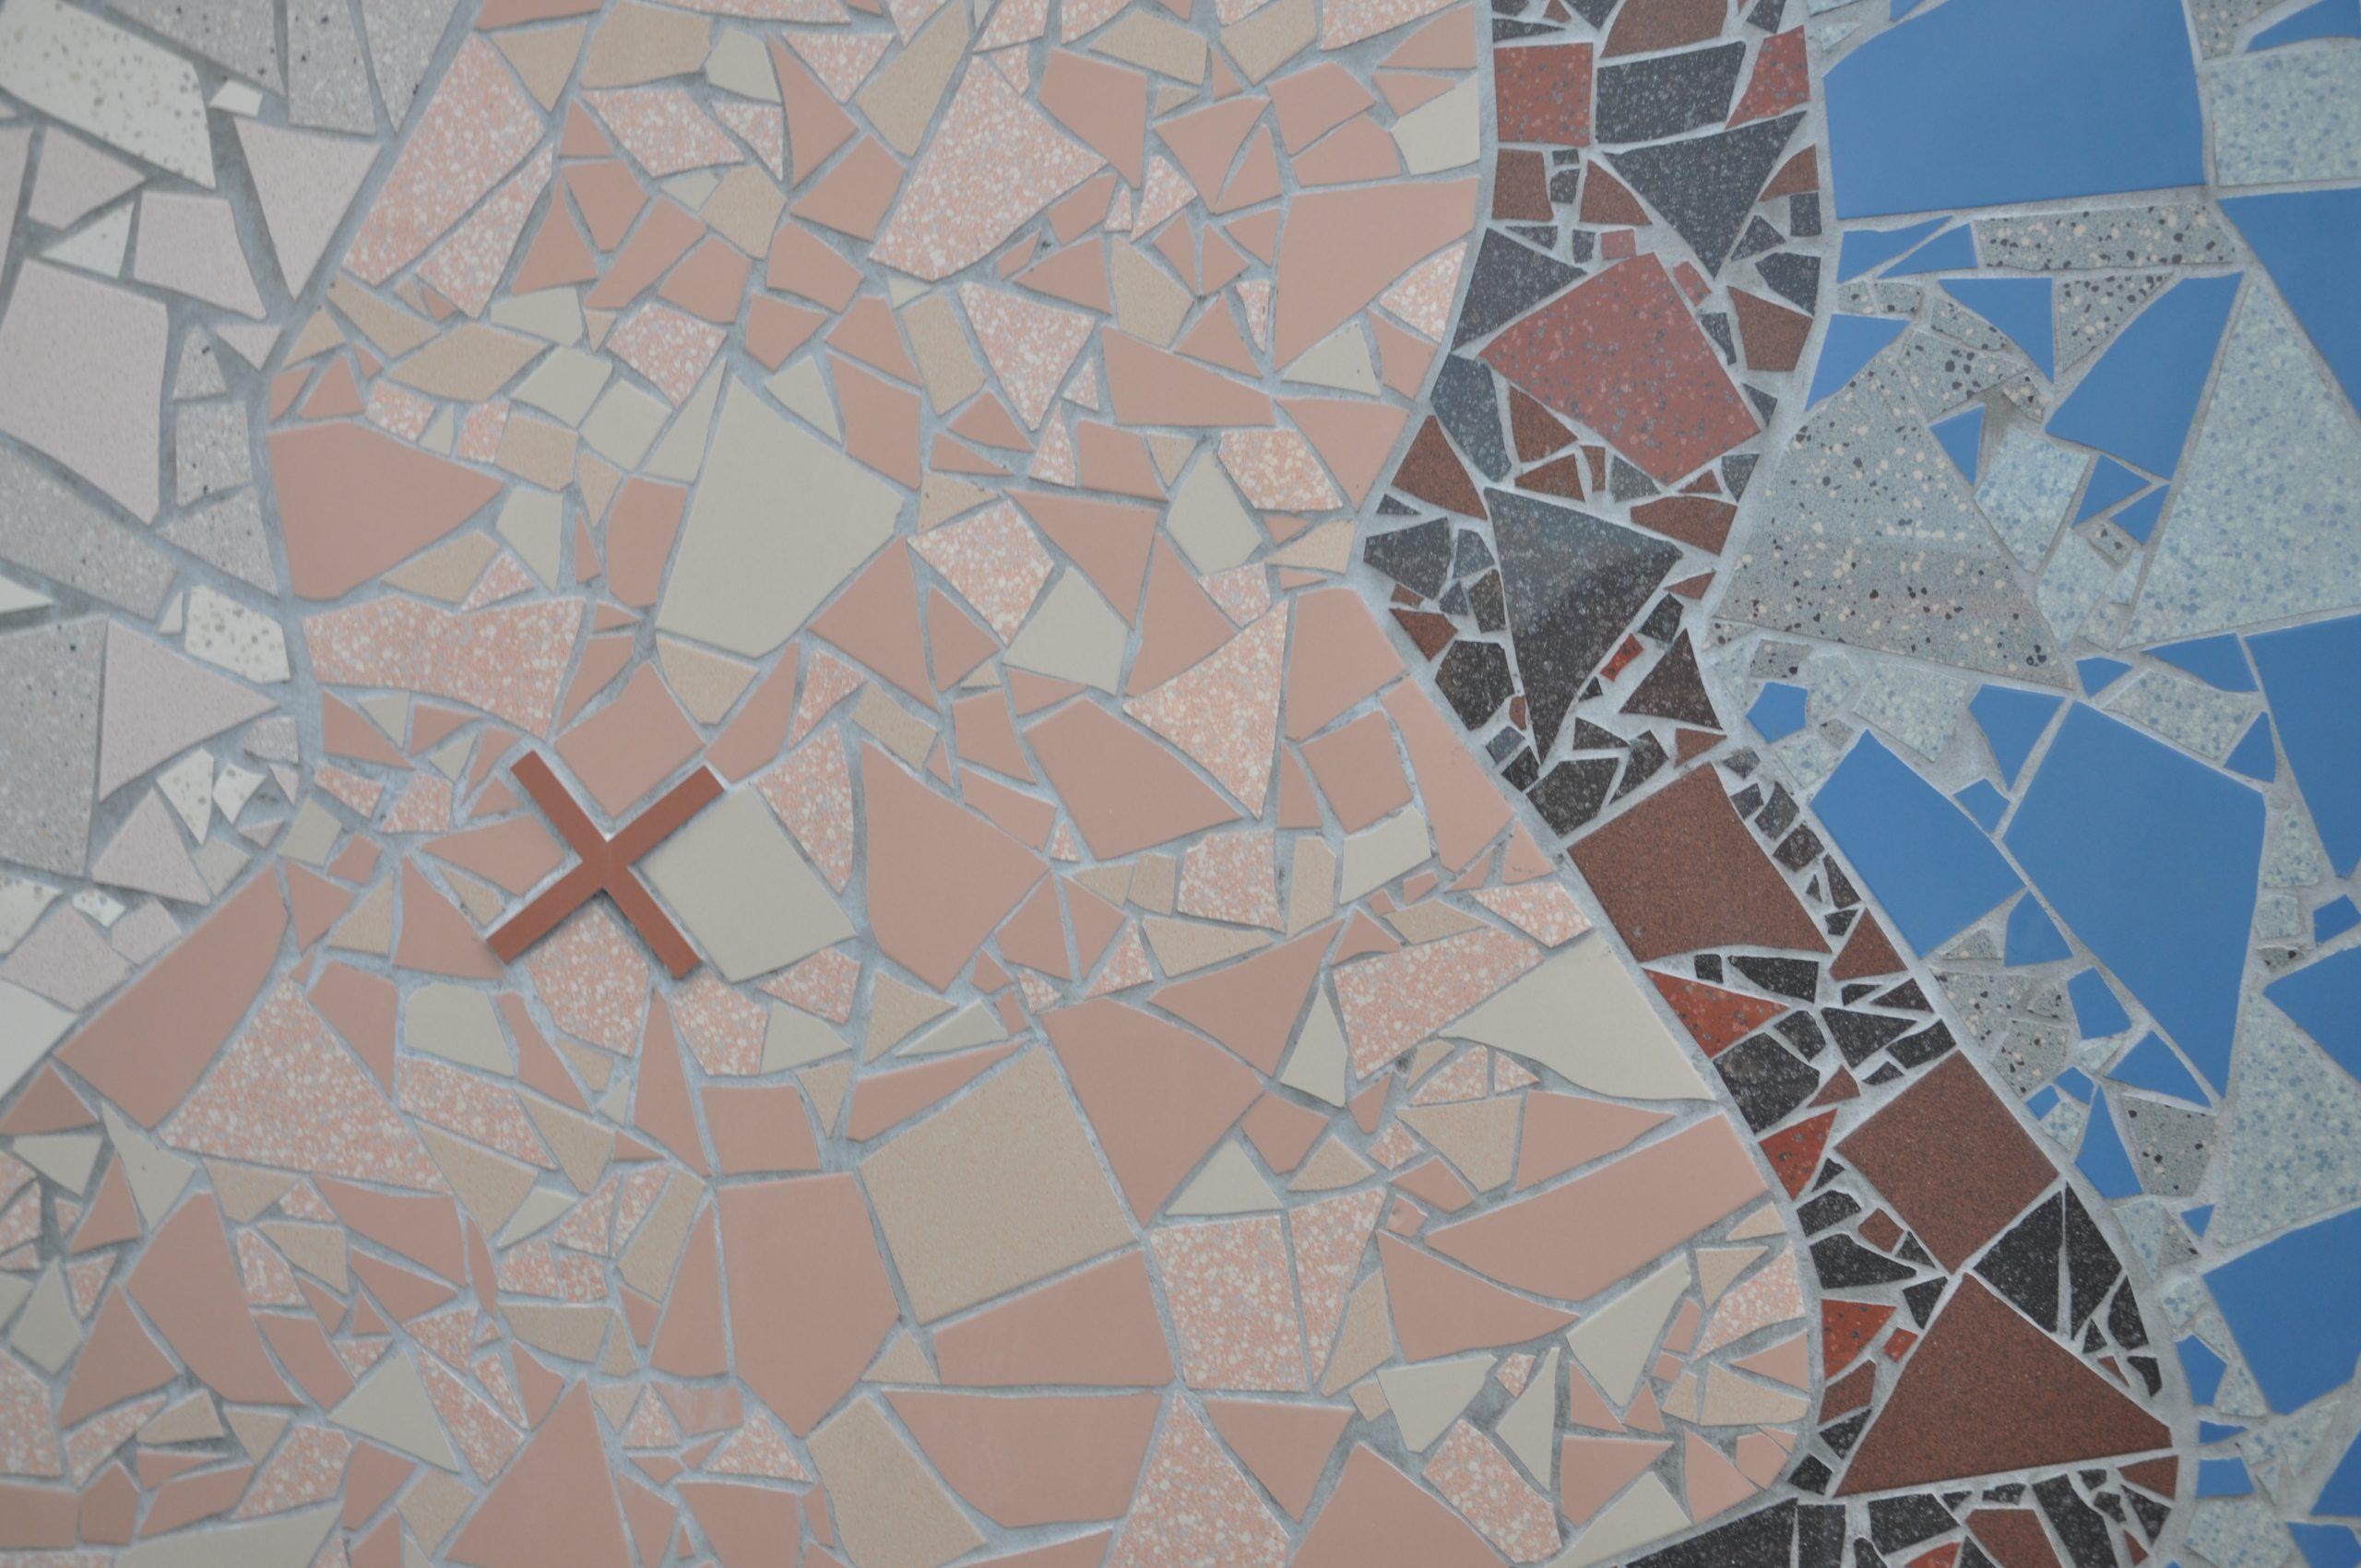 The New Easterhouse Mosaic